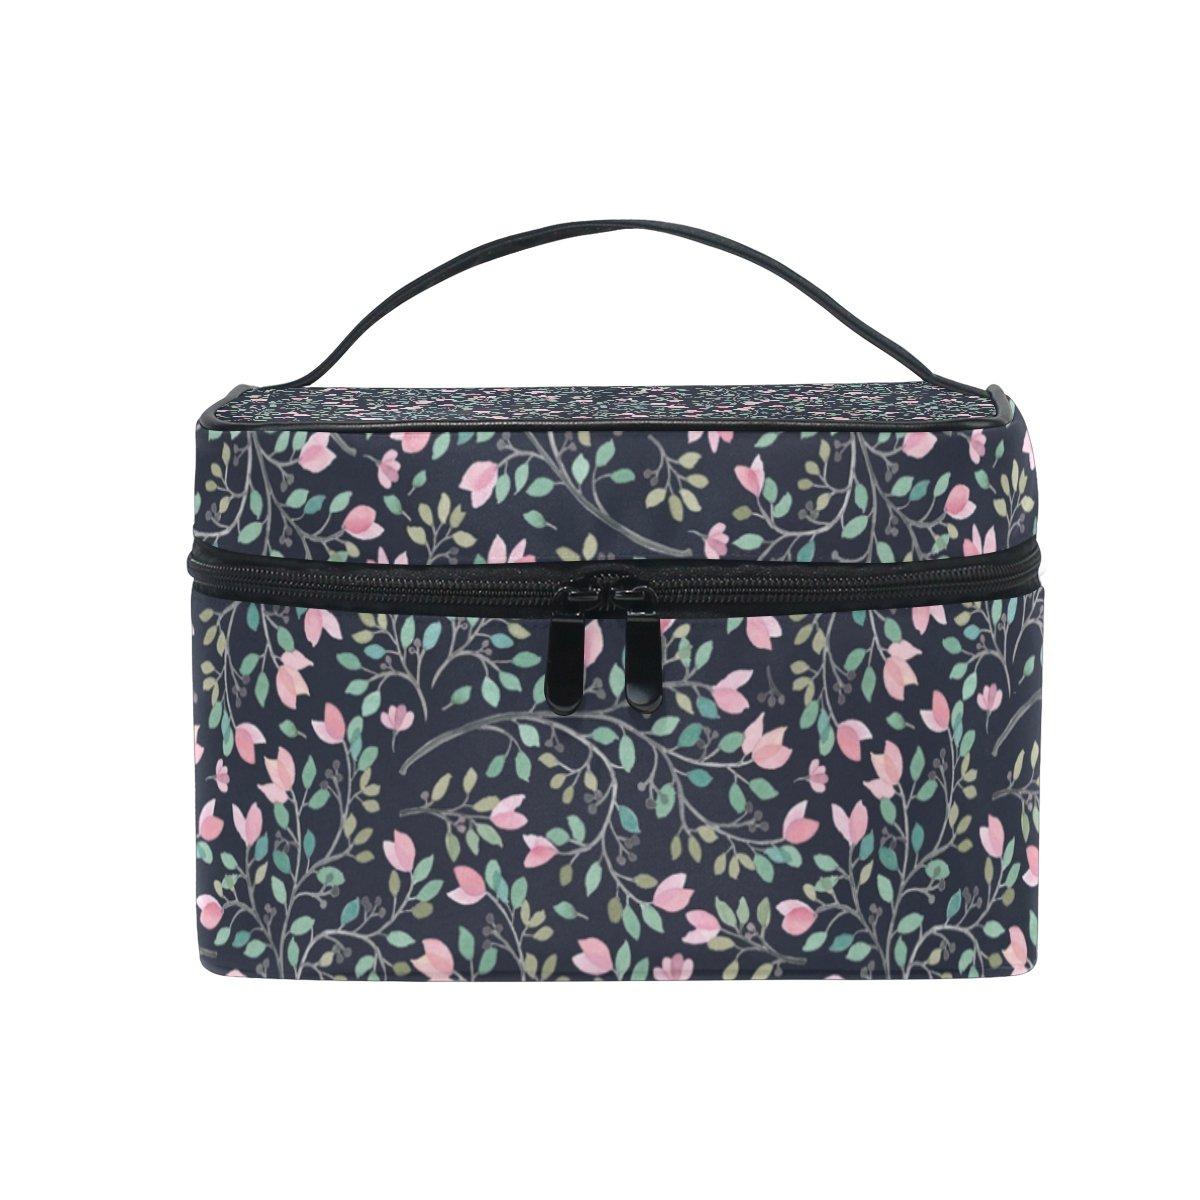 OREZI Elegant Pattern Travel Makeup Case Cosmetic Bag for Girl Women, Large Capacity and Adjustable Makeup Bags Travel Waterproof Toiletry Bag Accessories Organizer